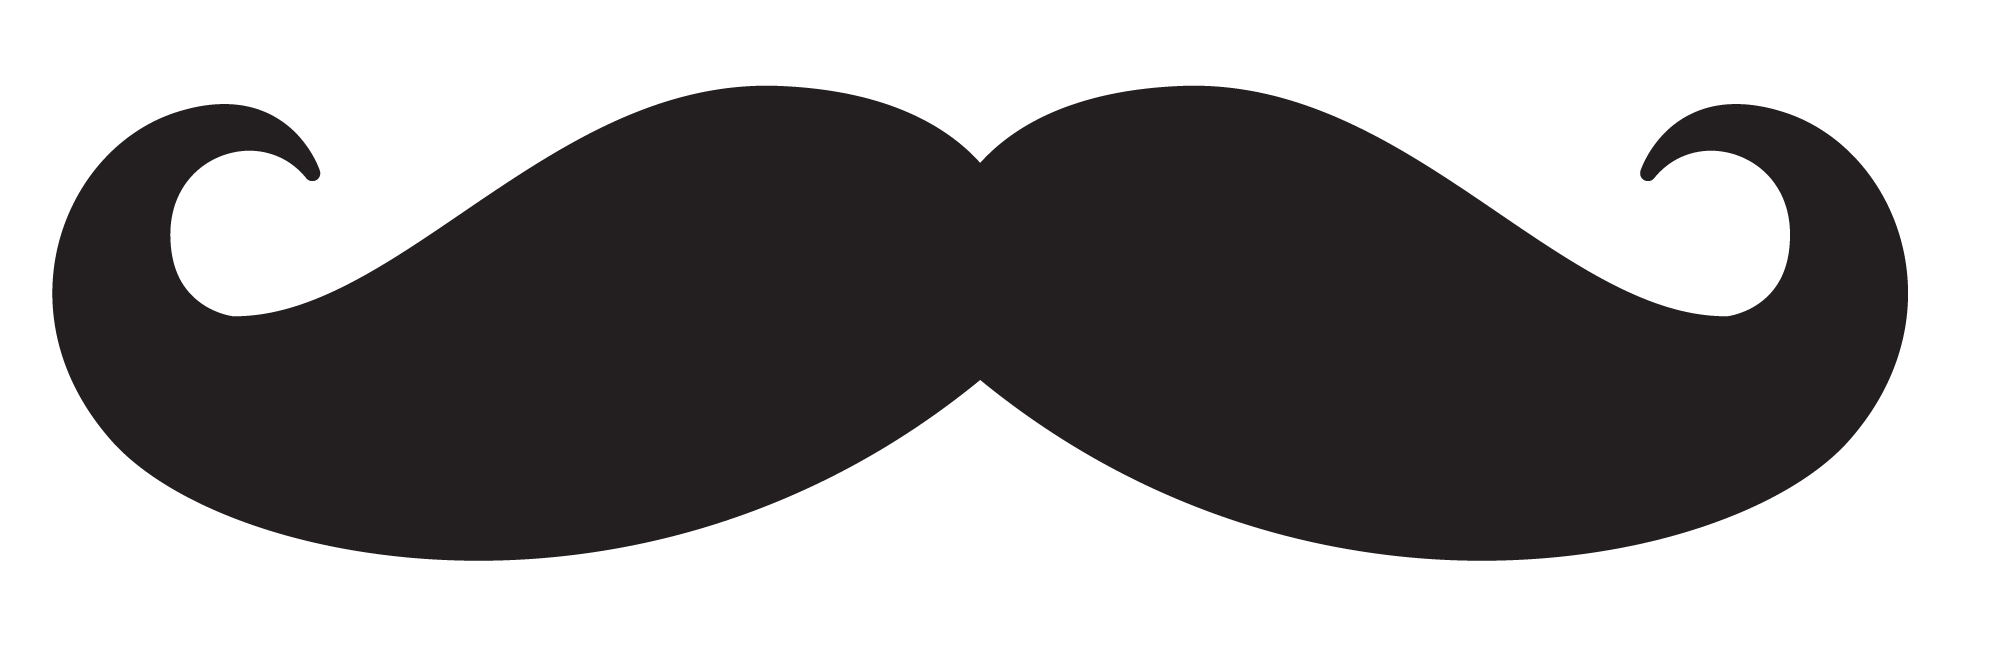 Clipart mustache clipart